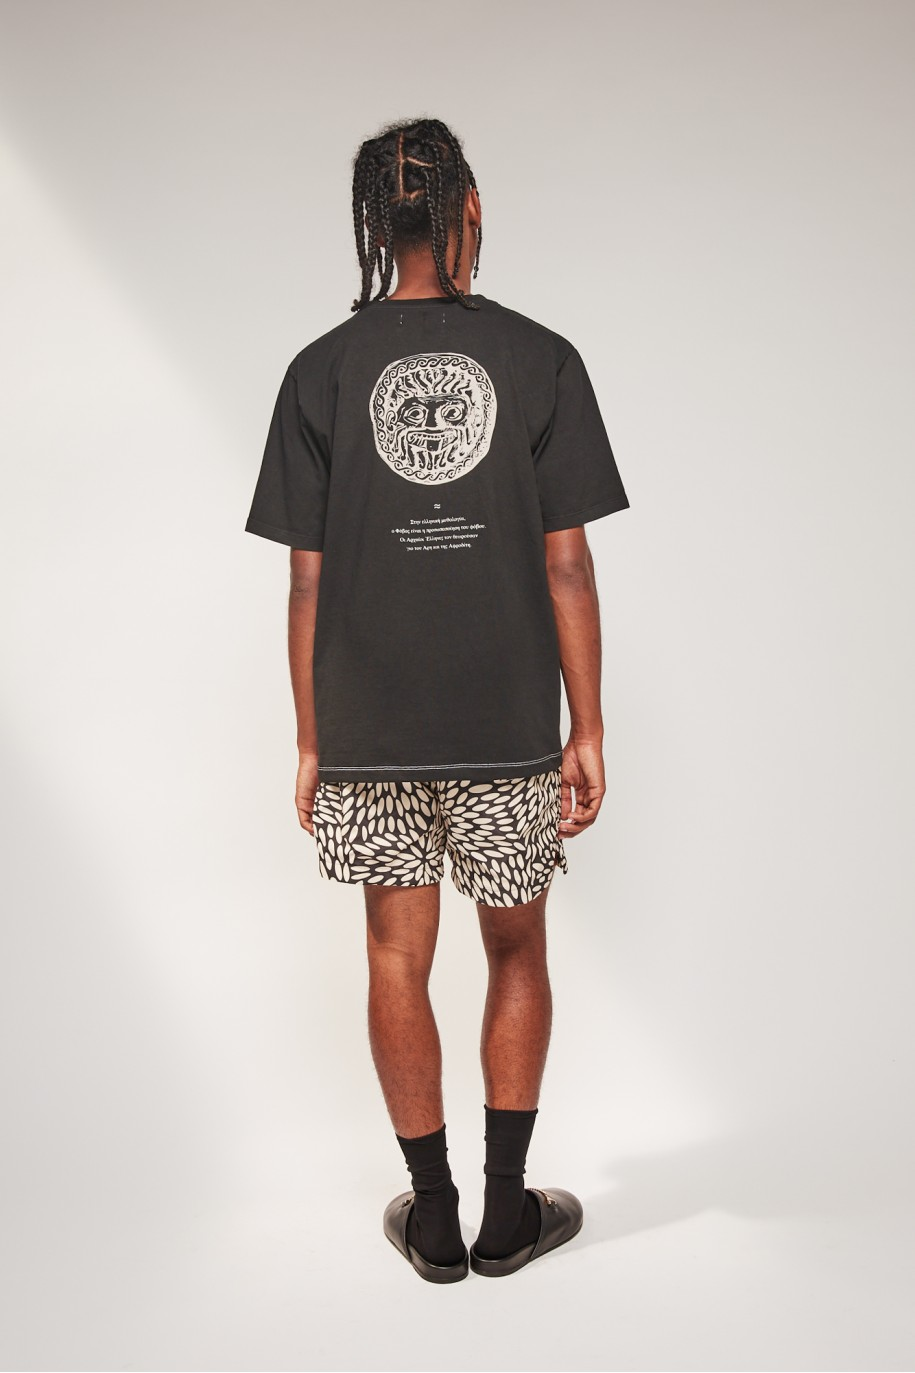 regulart-t-shirt-black